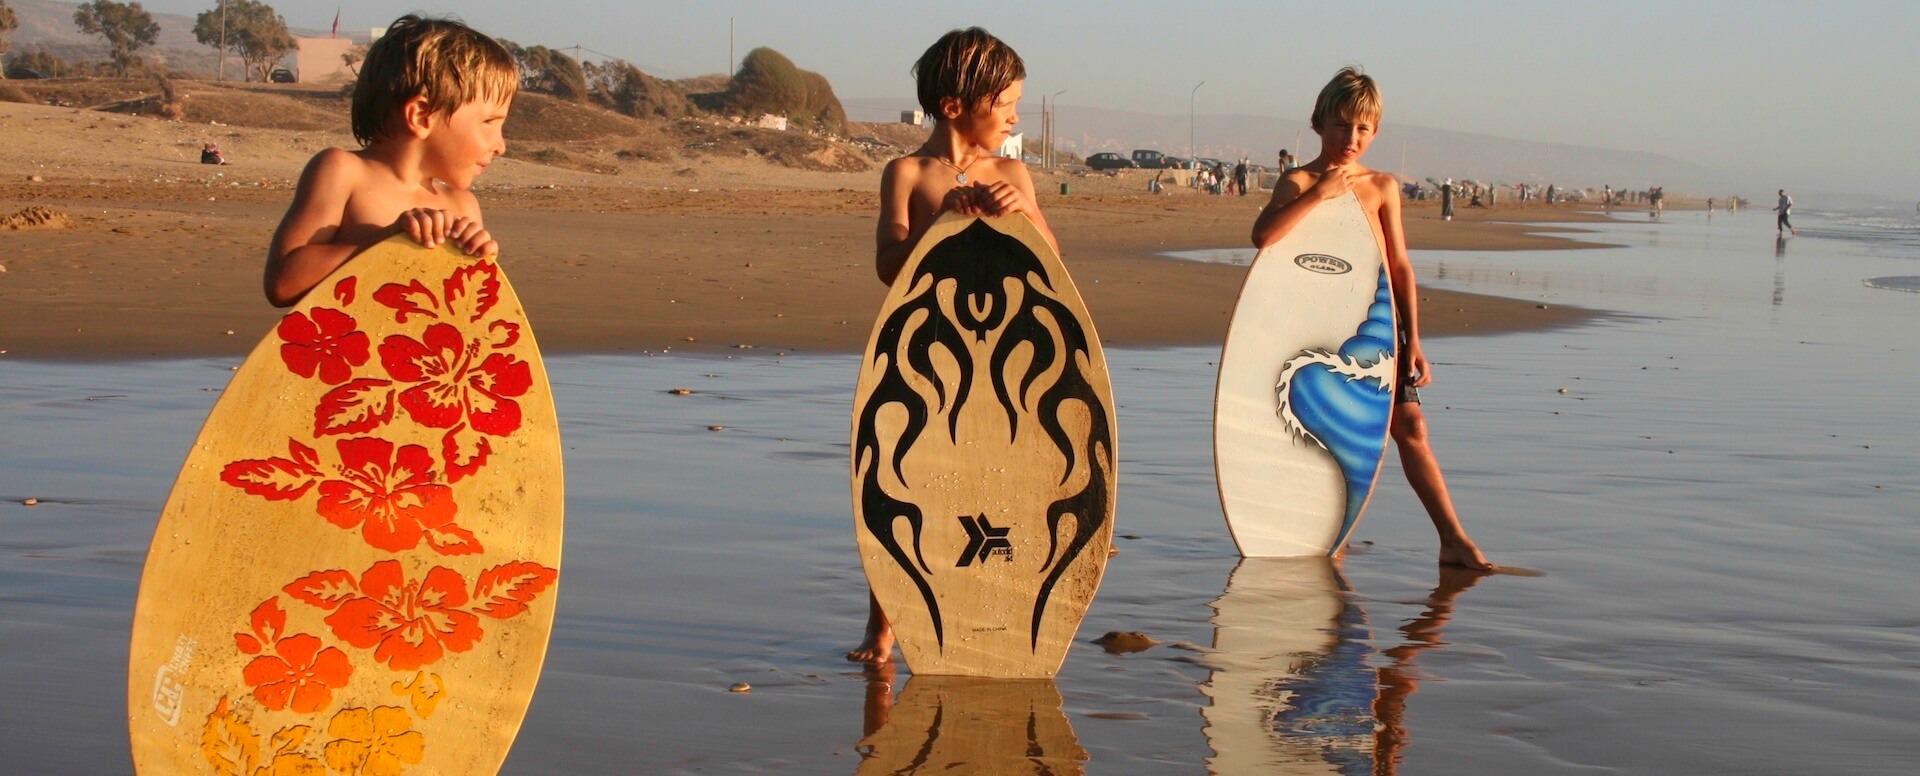 2. S'amuser à essayer différents sports - Essaouira